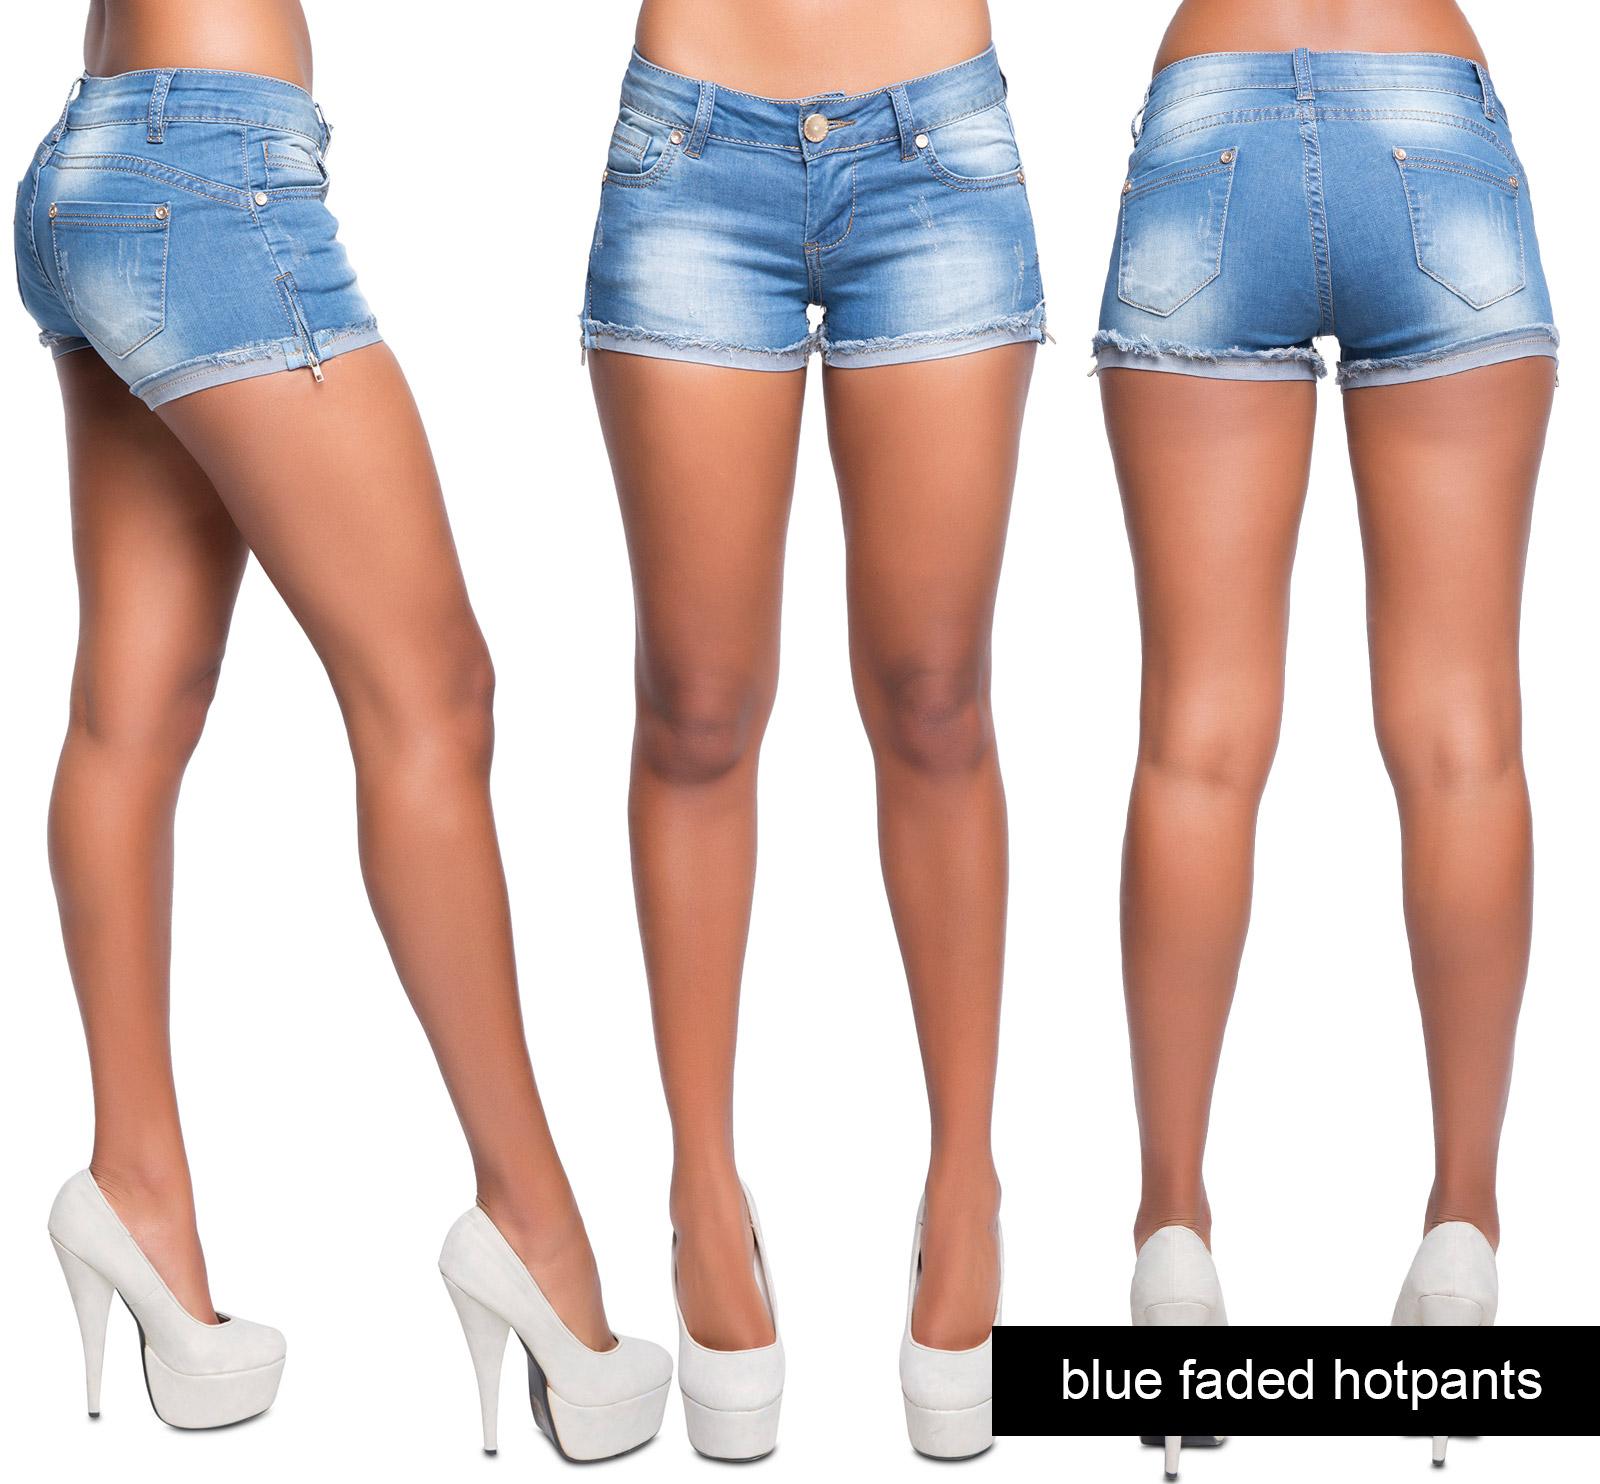 womens sexy blue denim hot pants ladies rip jean summer shorts size 6 8 10 12 14 ebay. Black Bedroom Furniture Sets. Home Design Ideas